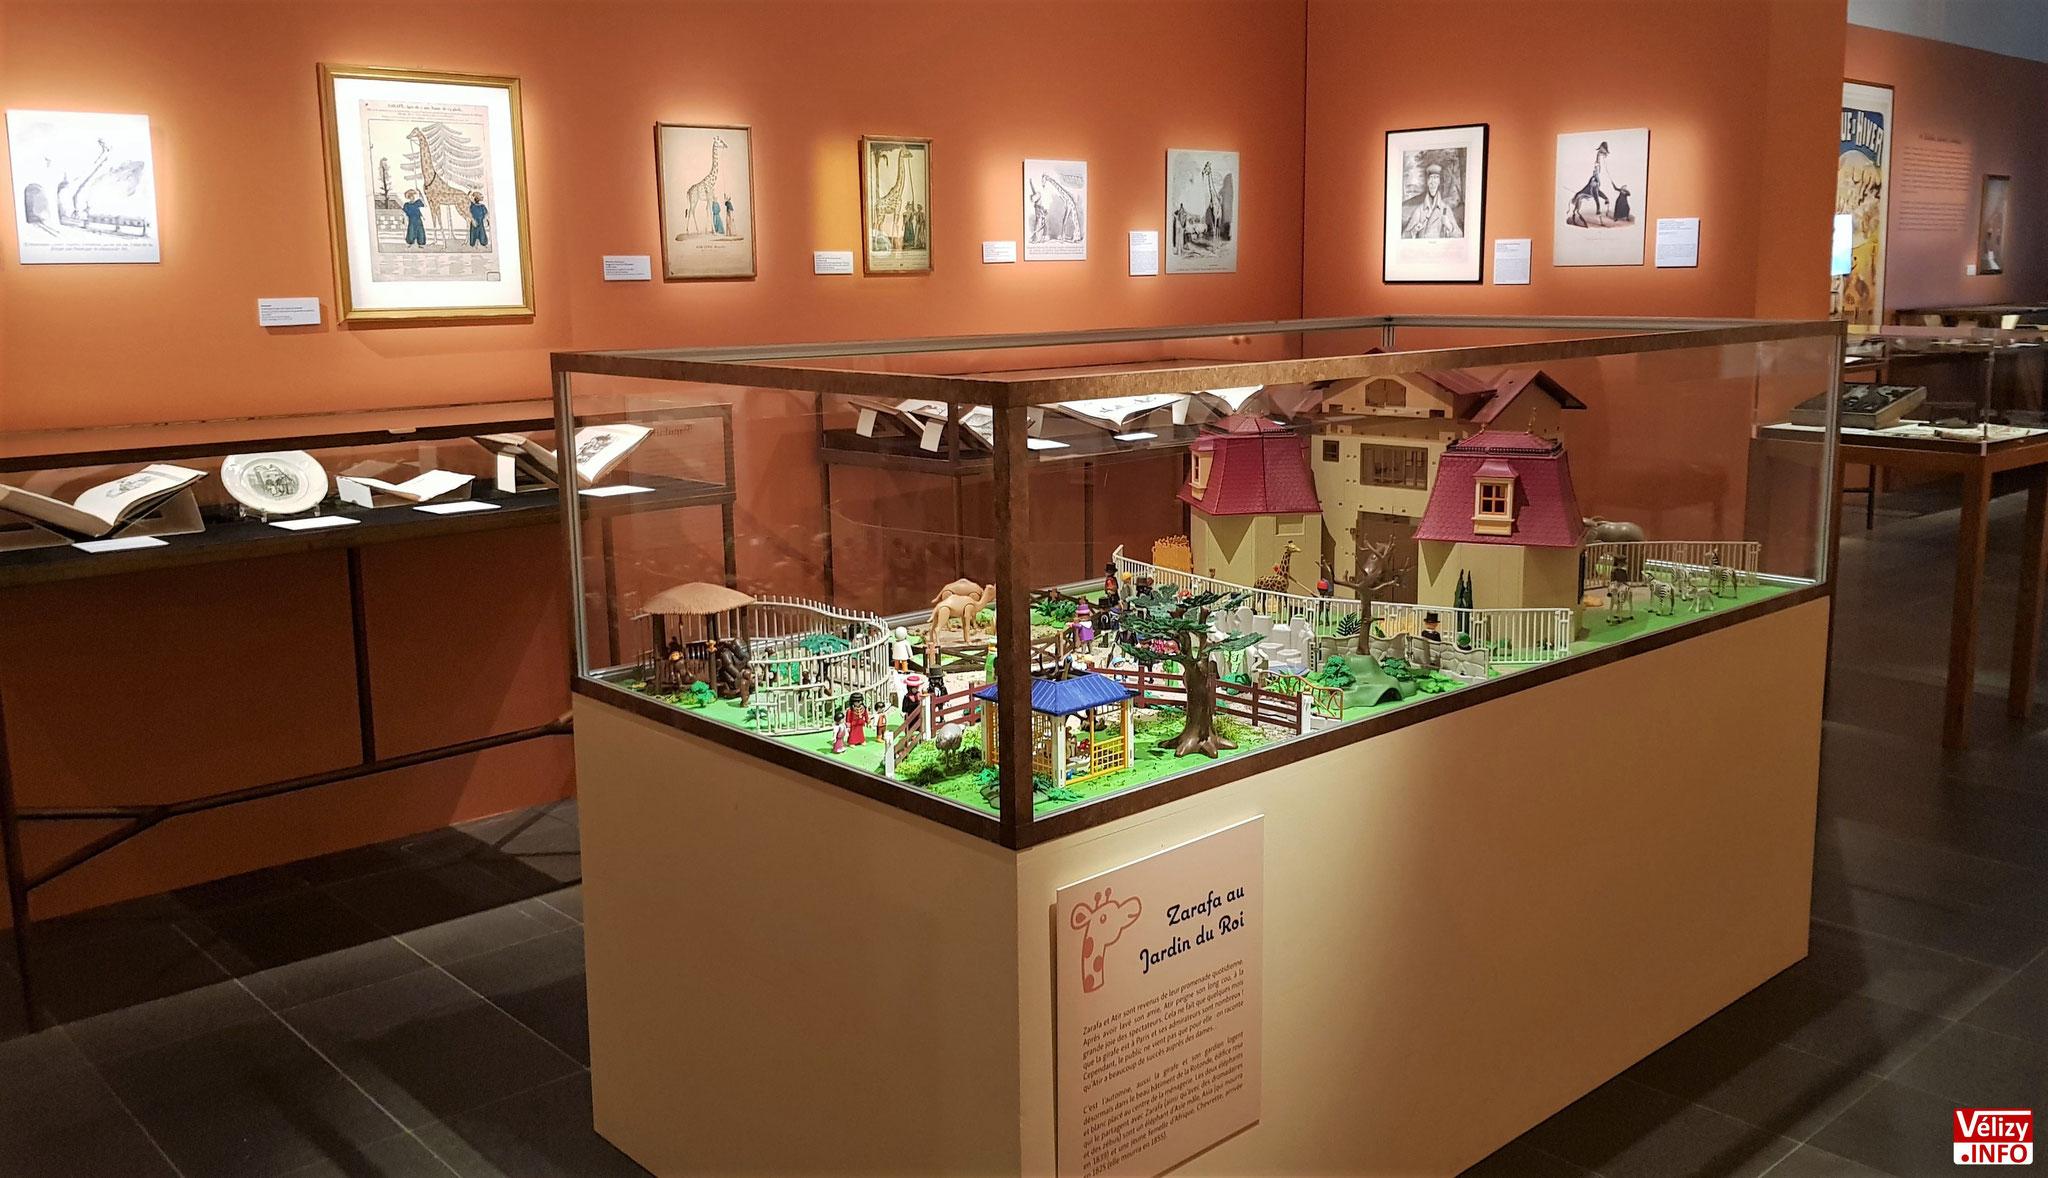 Zarafa au jardin du roi. Diorama de Jean-Philippe Broussin. Play-Original